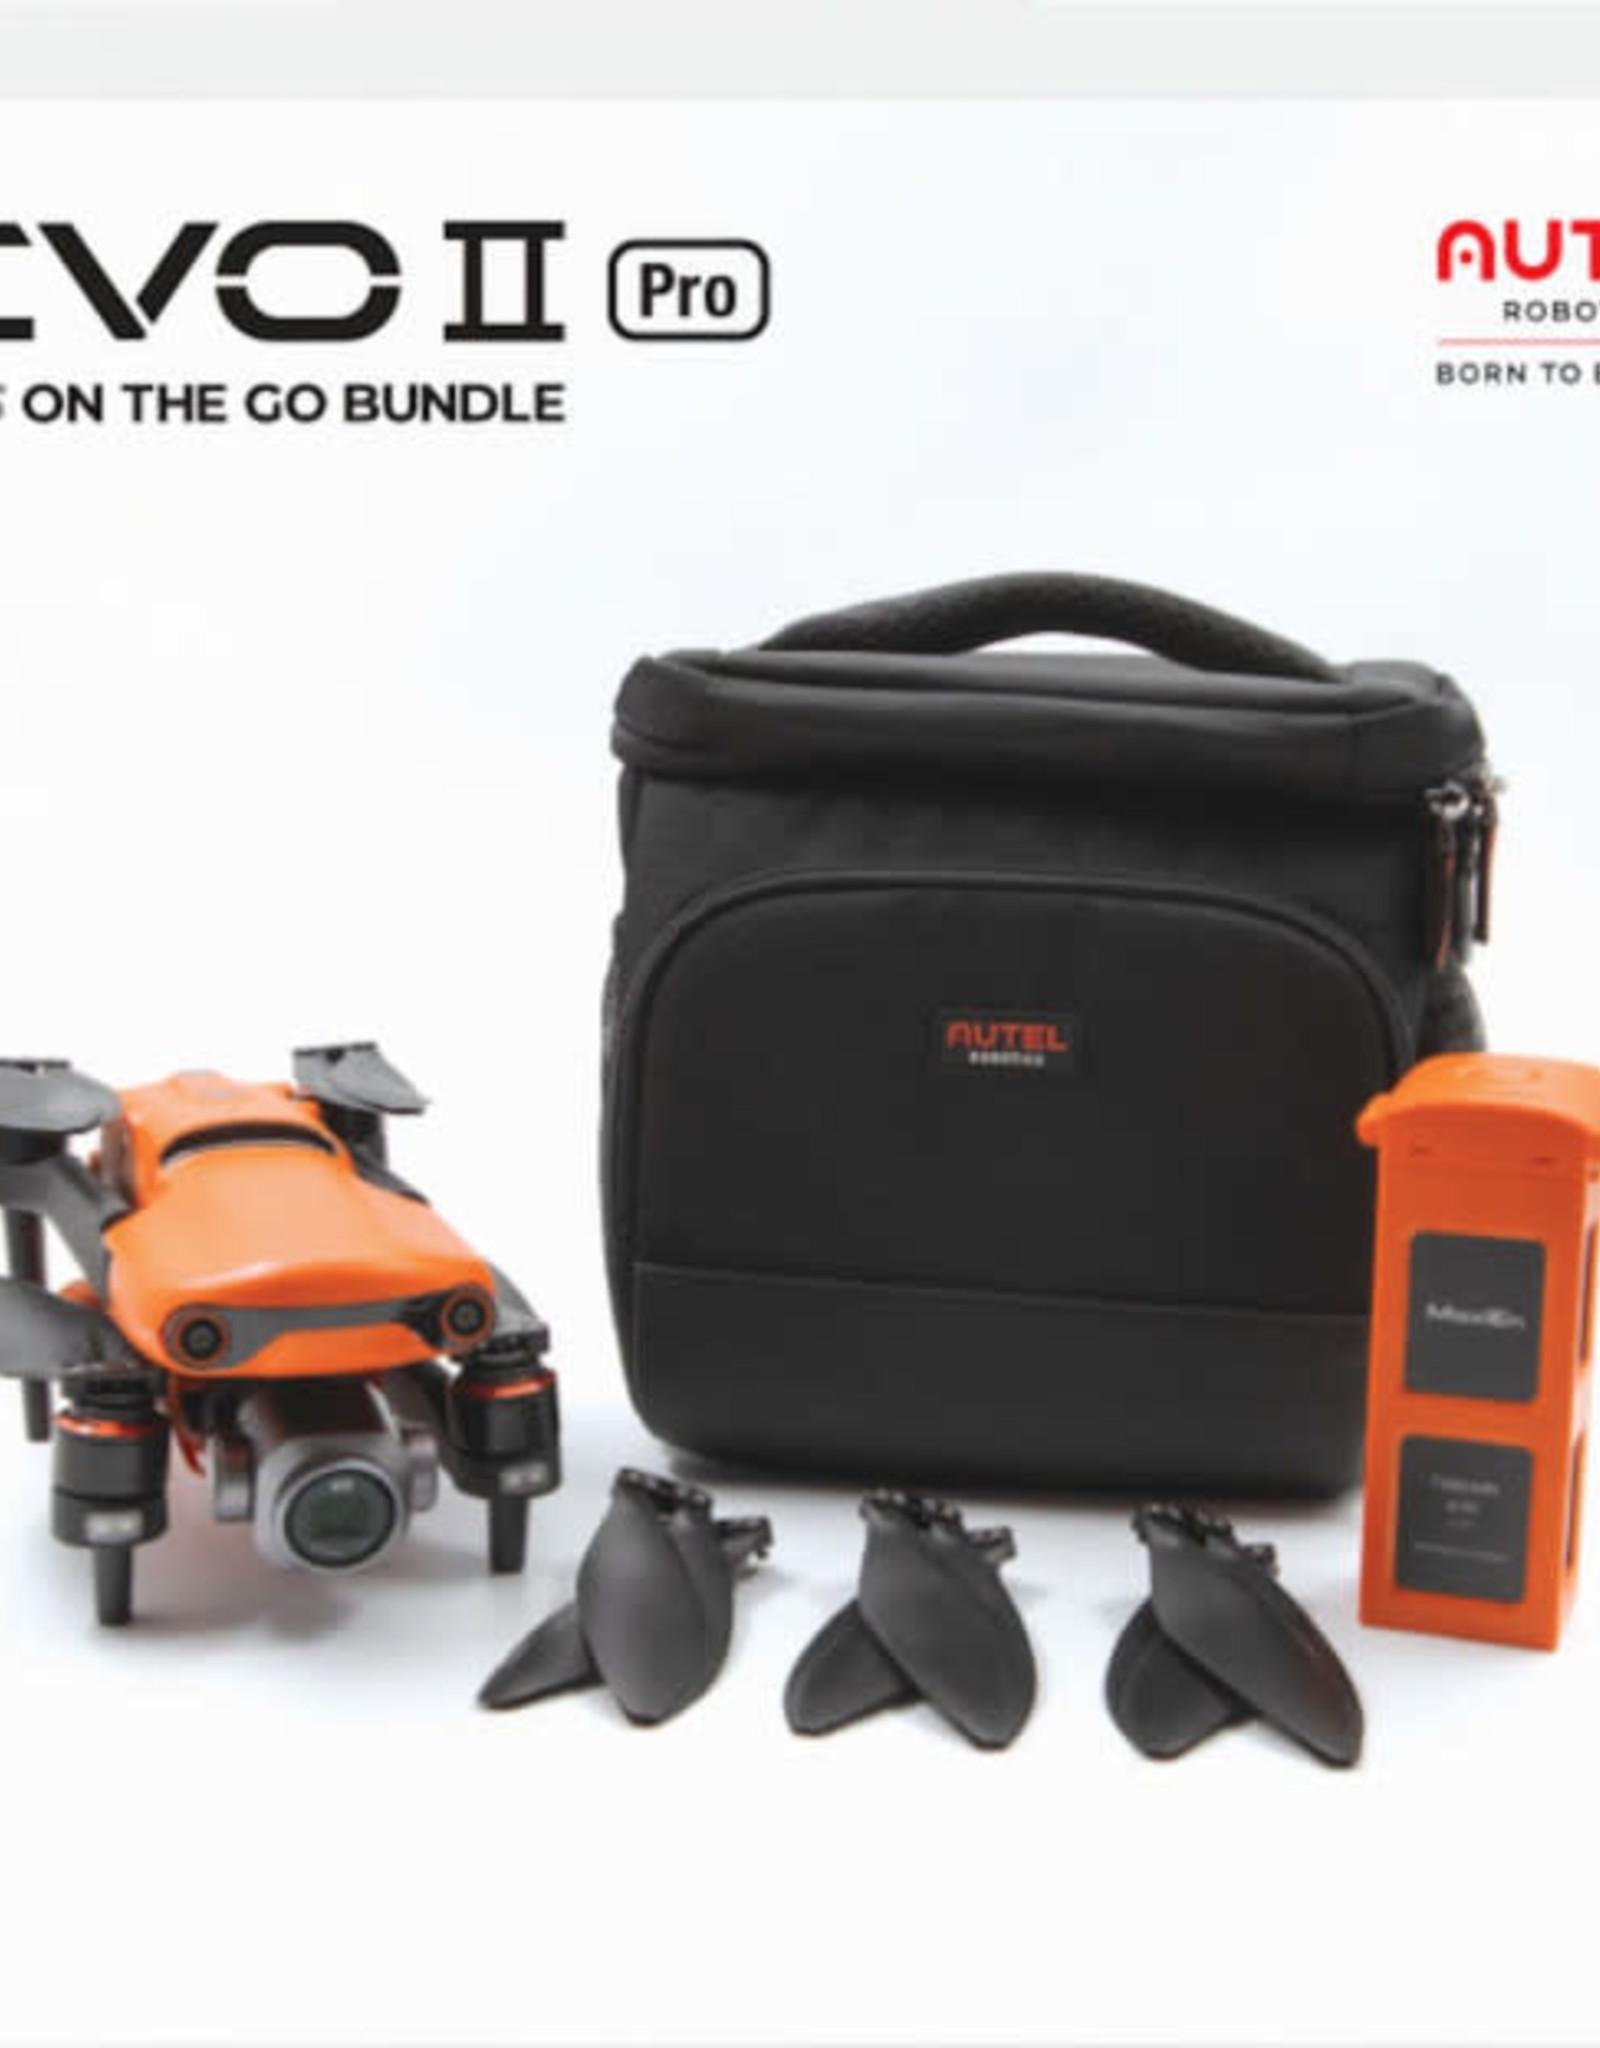 Autel Robotics EVO II Pro 6K Plus On The Go Bundle - Black/Orange